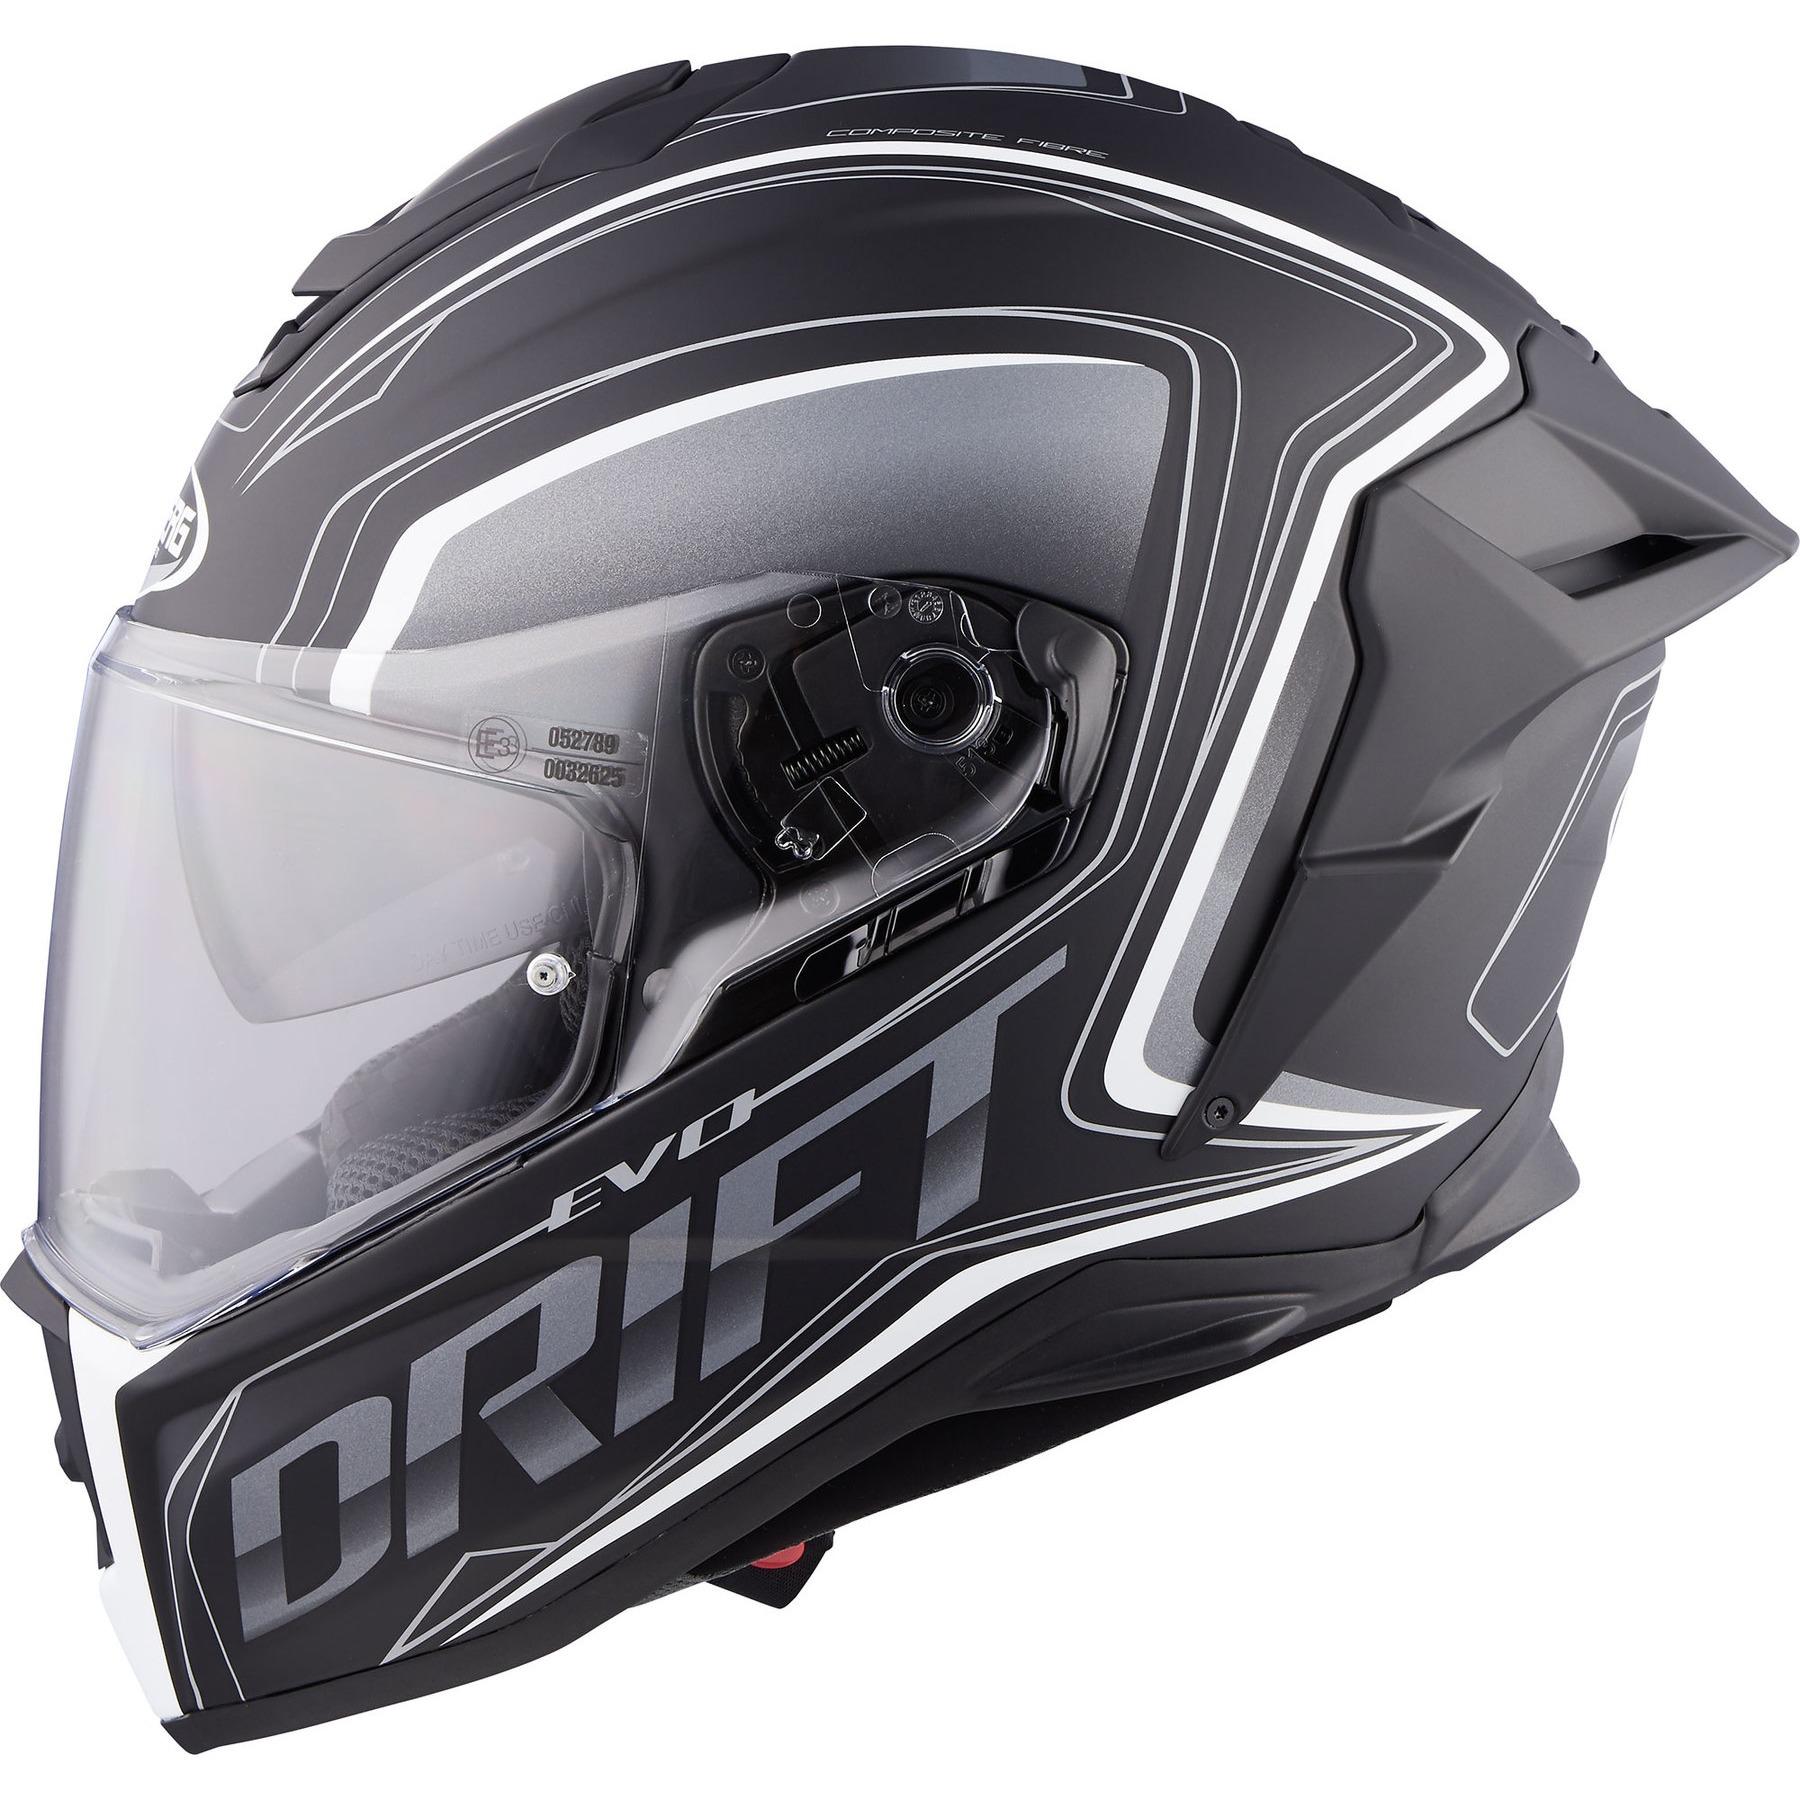 Caberg Drift Evo Integra Motorcycle Helmet